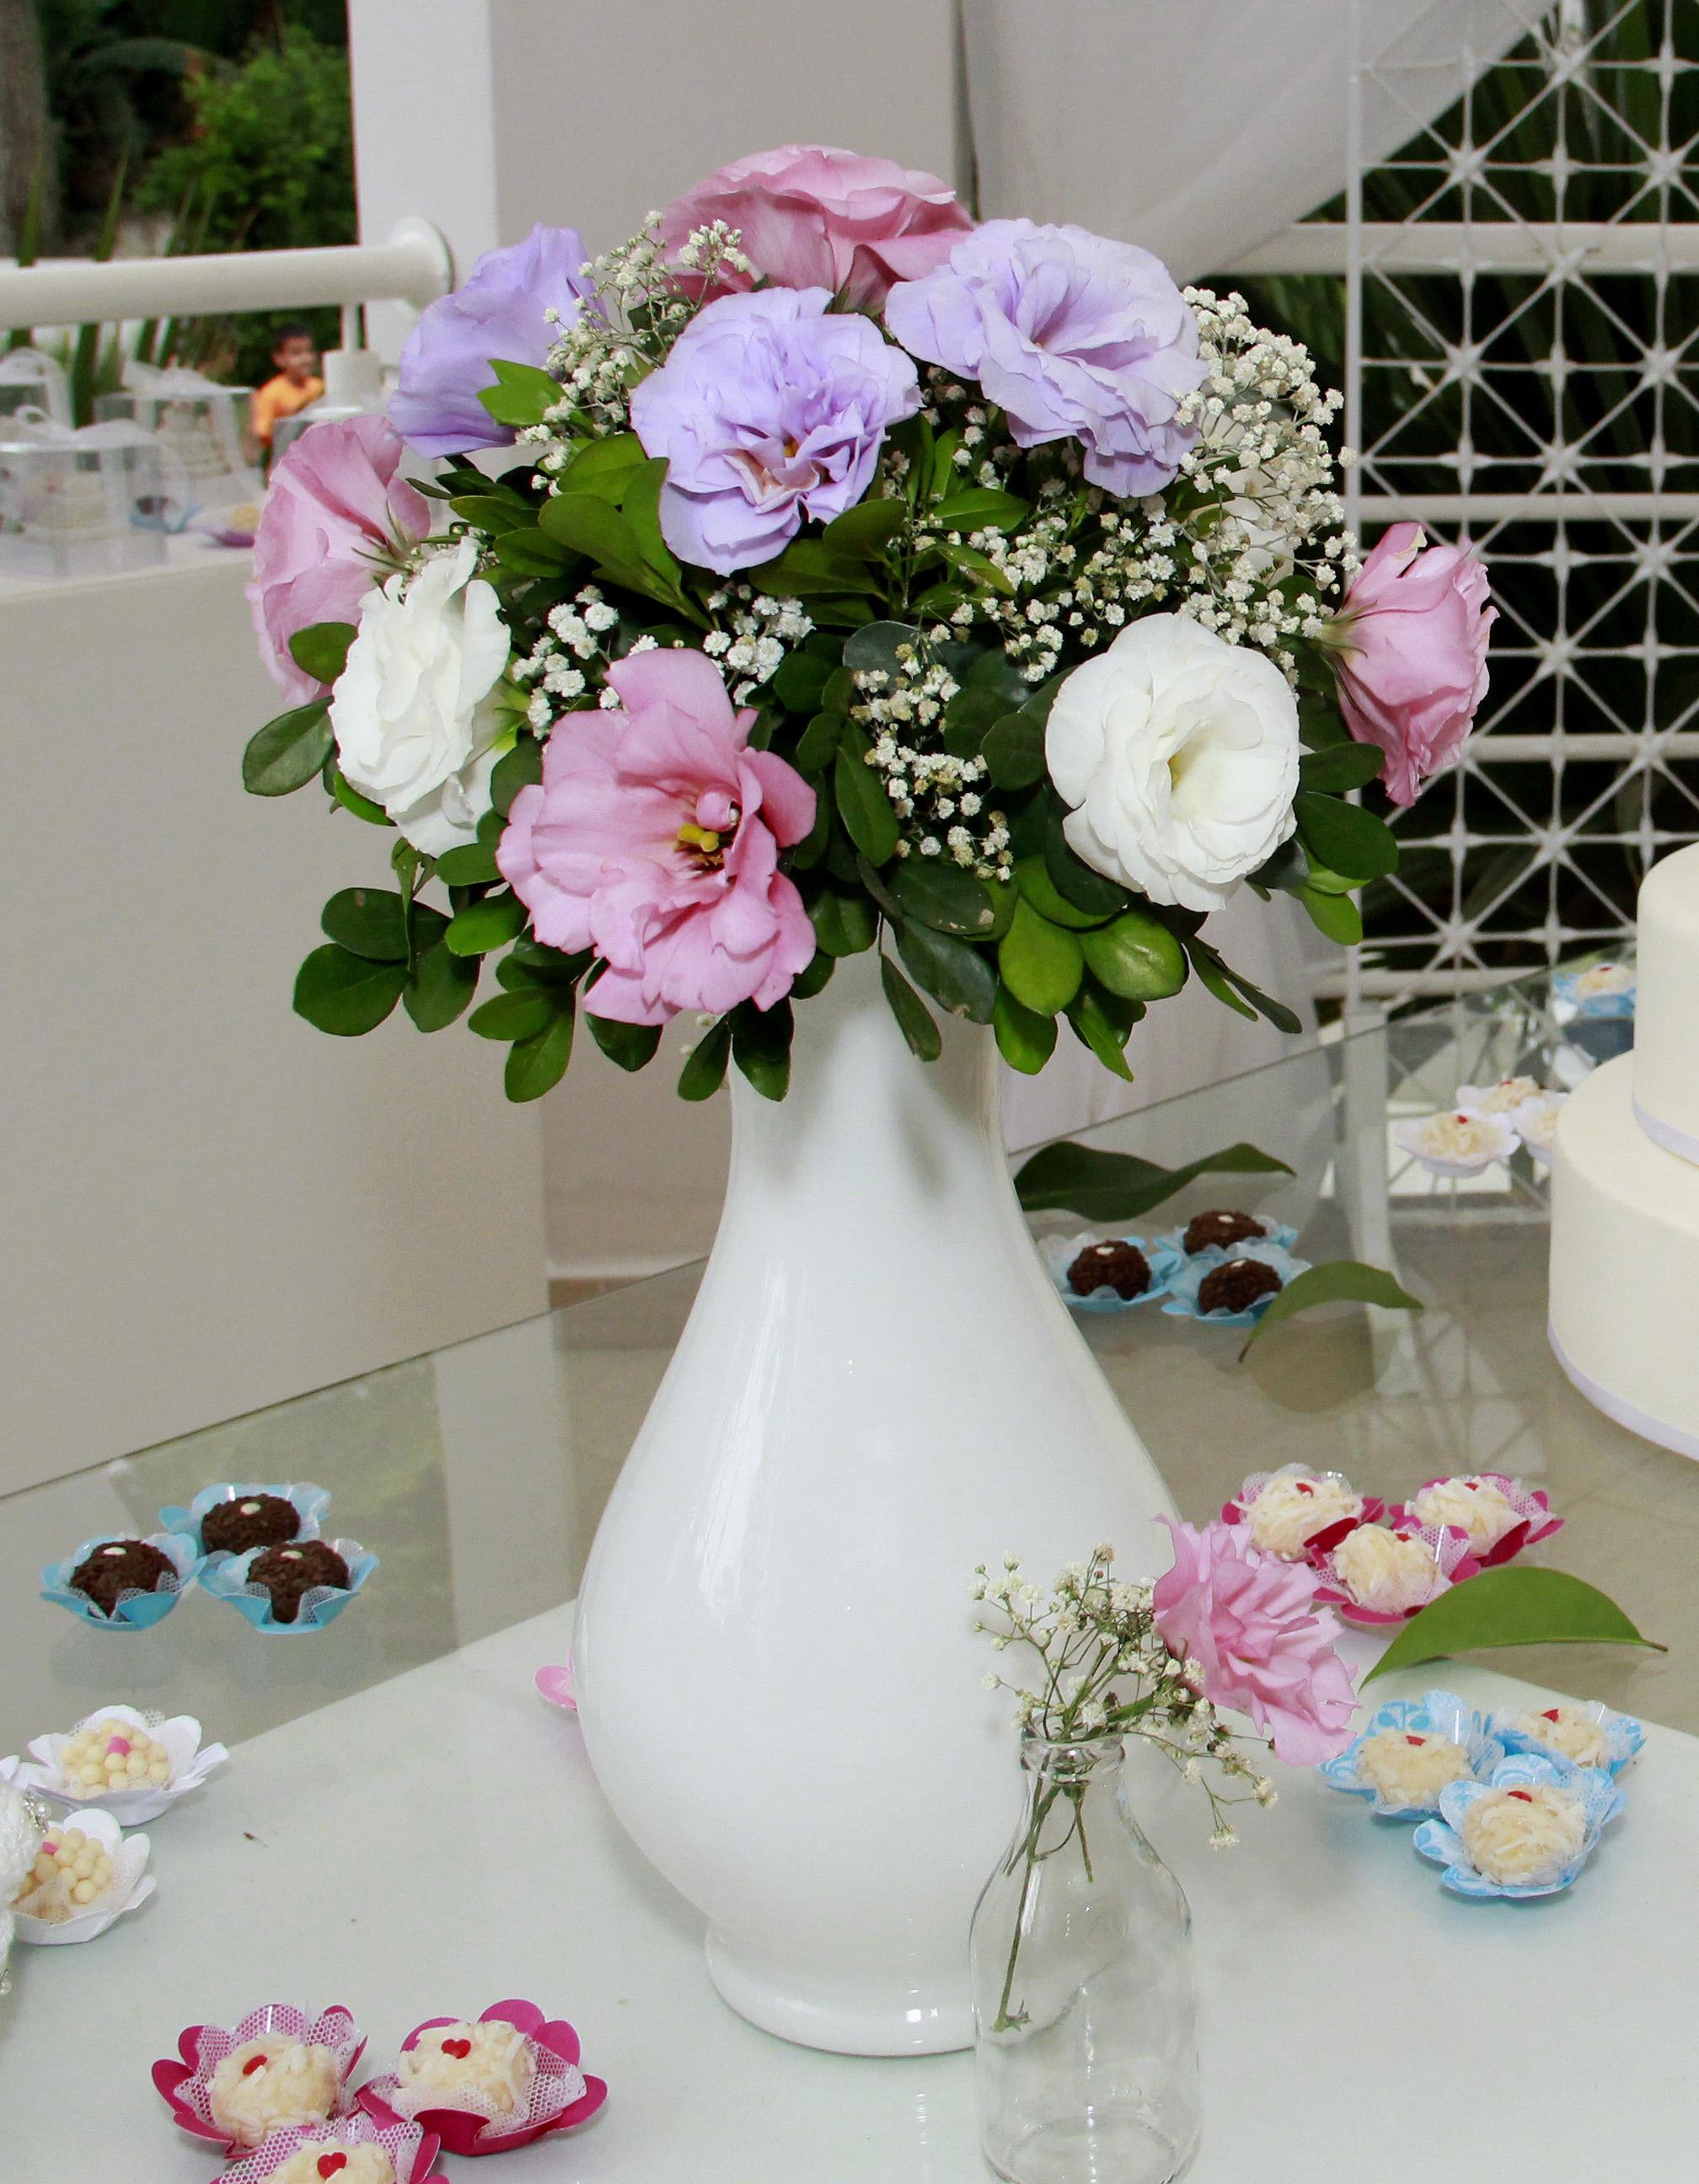 vasos decorativos para casamento onde comprar